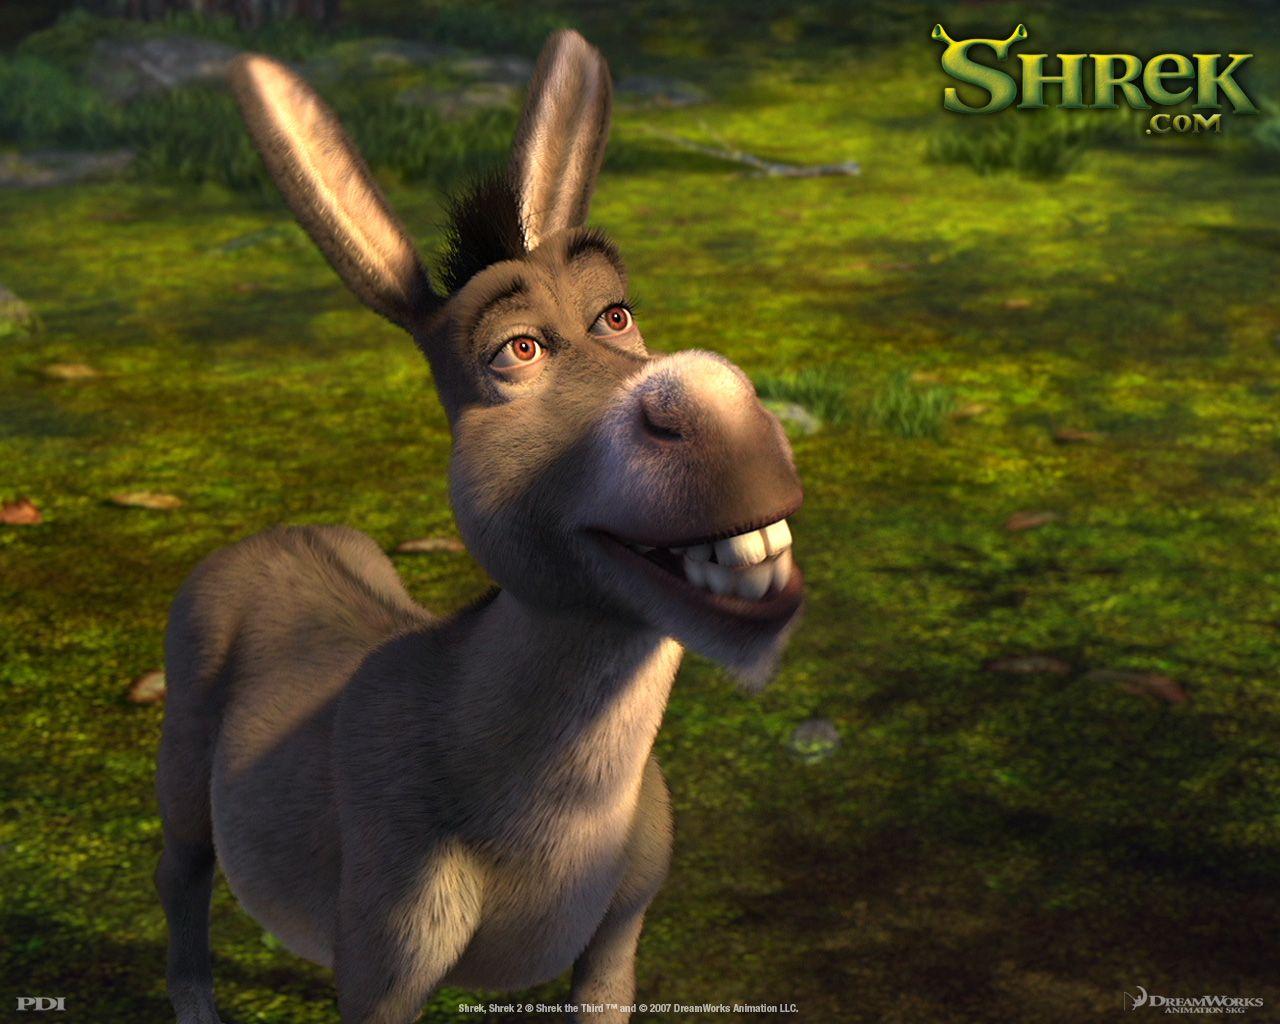 Donkey Wallpapers Movies I Like in 2019 Shrek memes